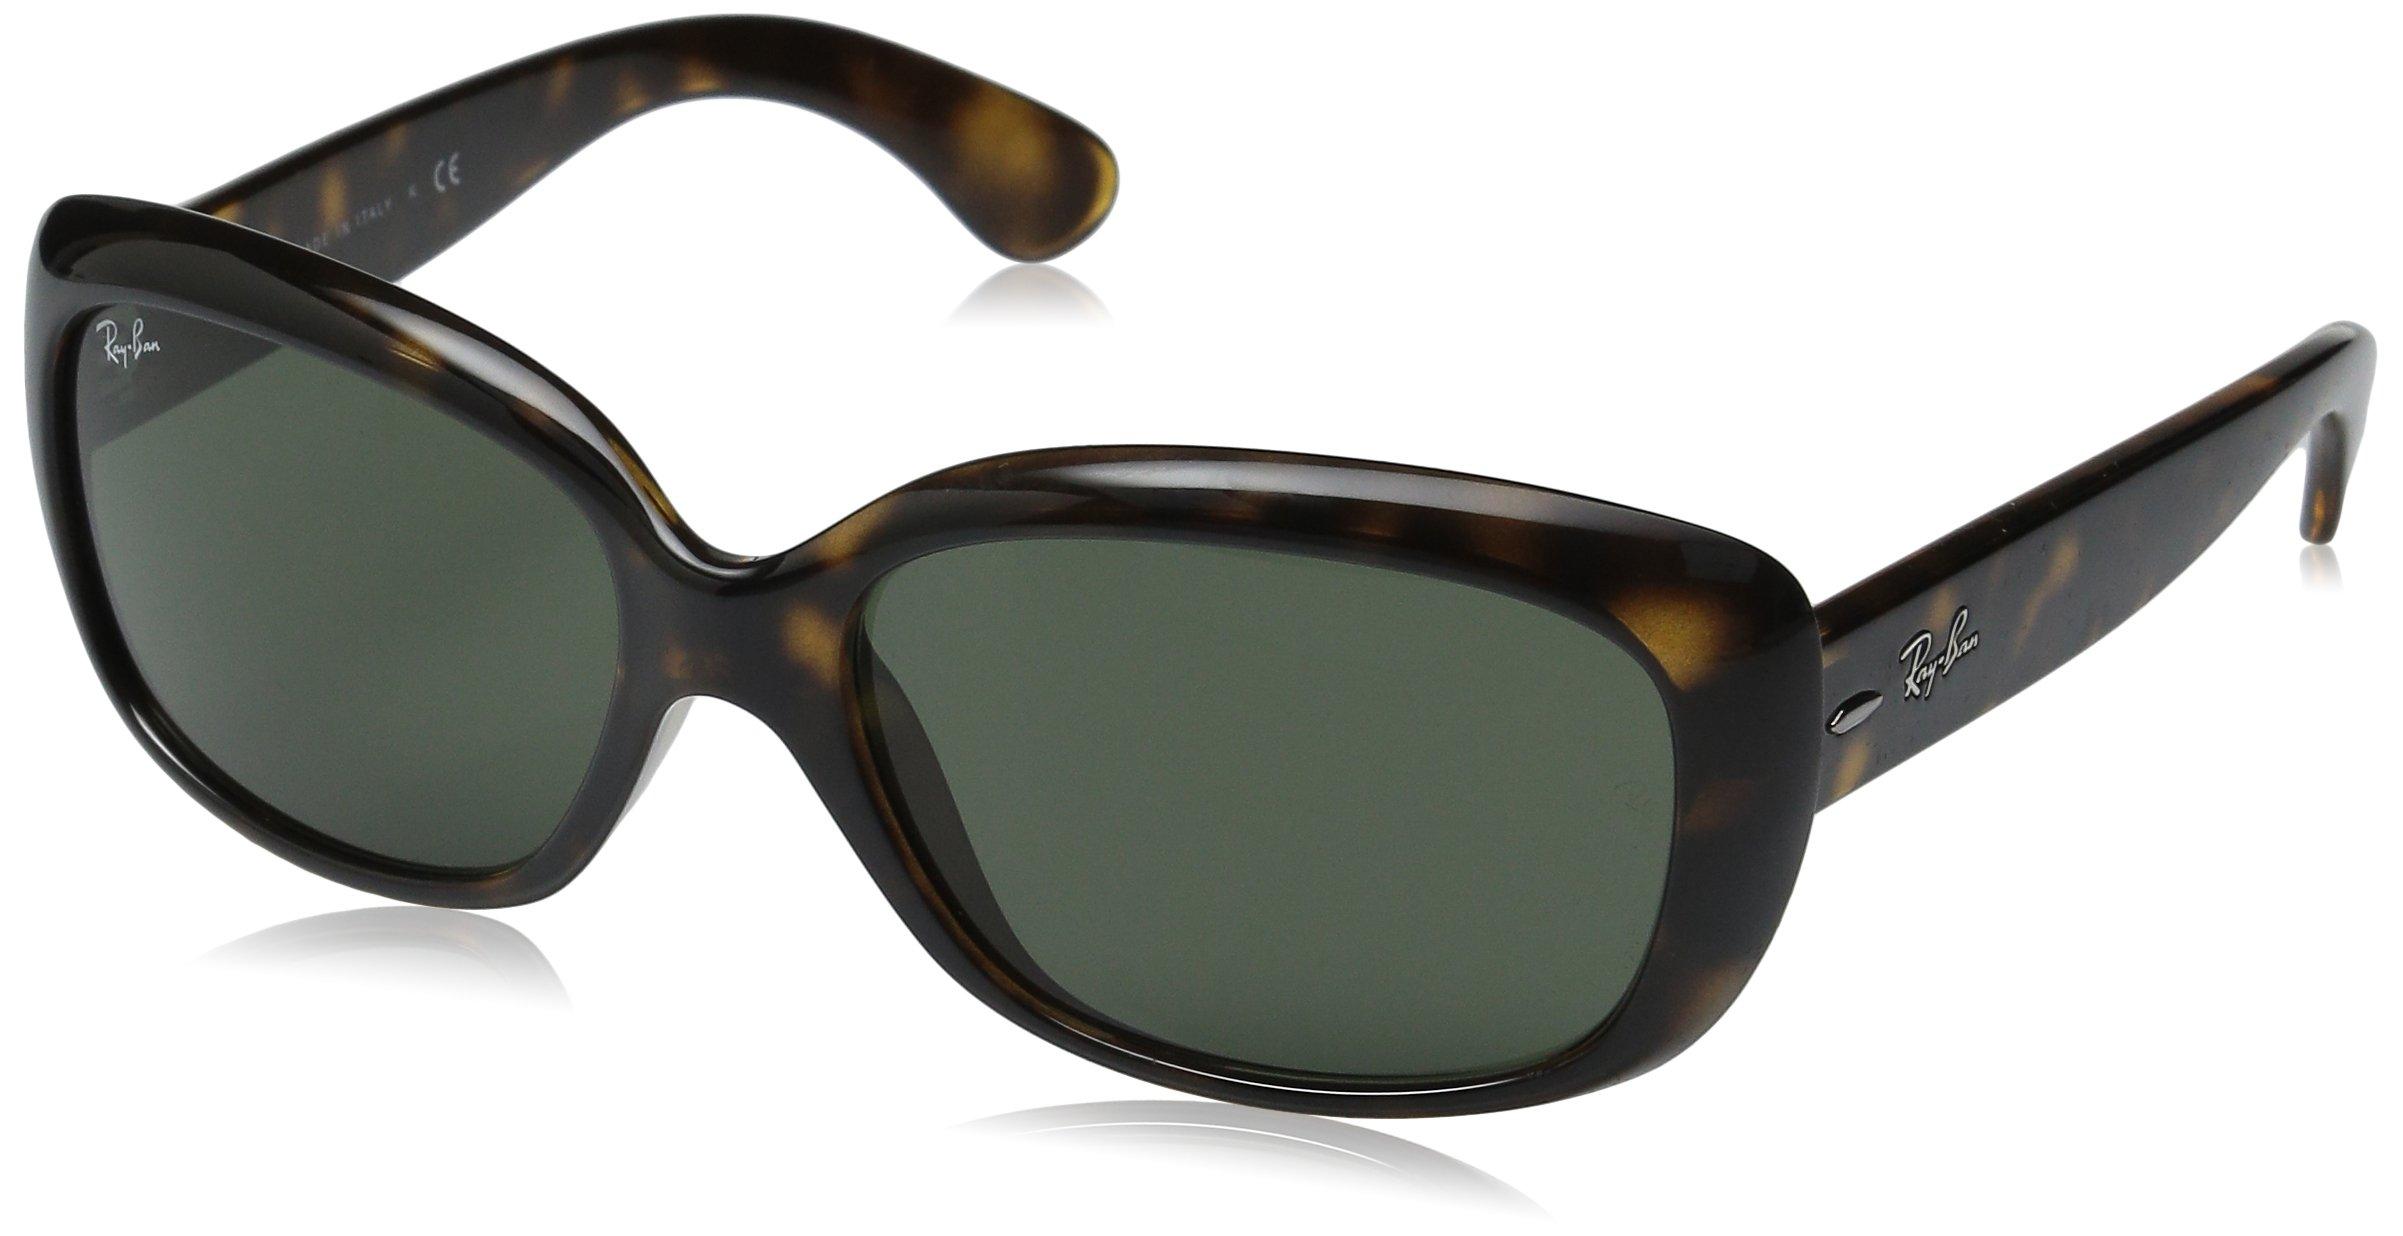 Ray-Ban RB4101 Jackie Ohh Highstreet Fashion Sunglasses - Light Havana/G-15 XLT / One Size Fits All